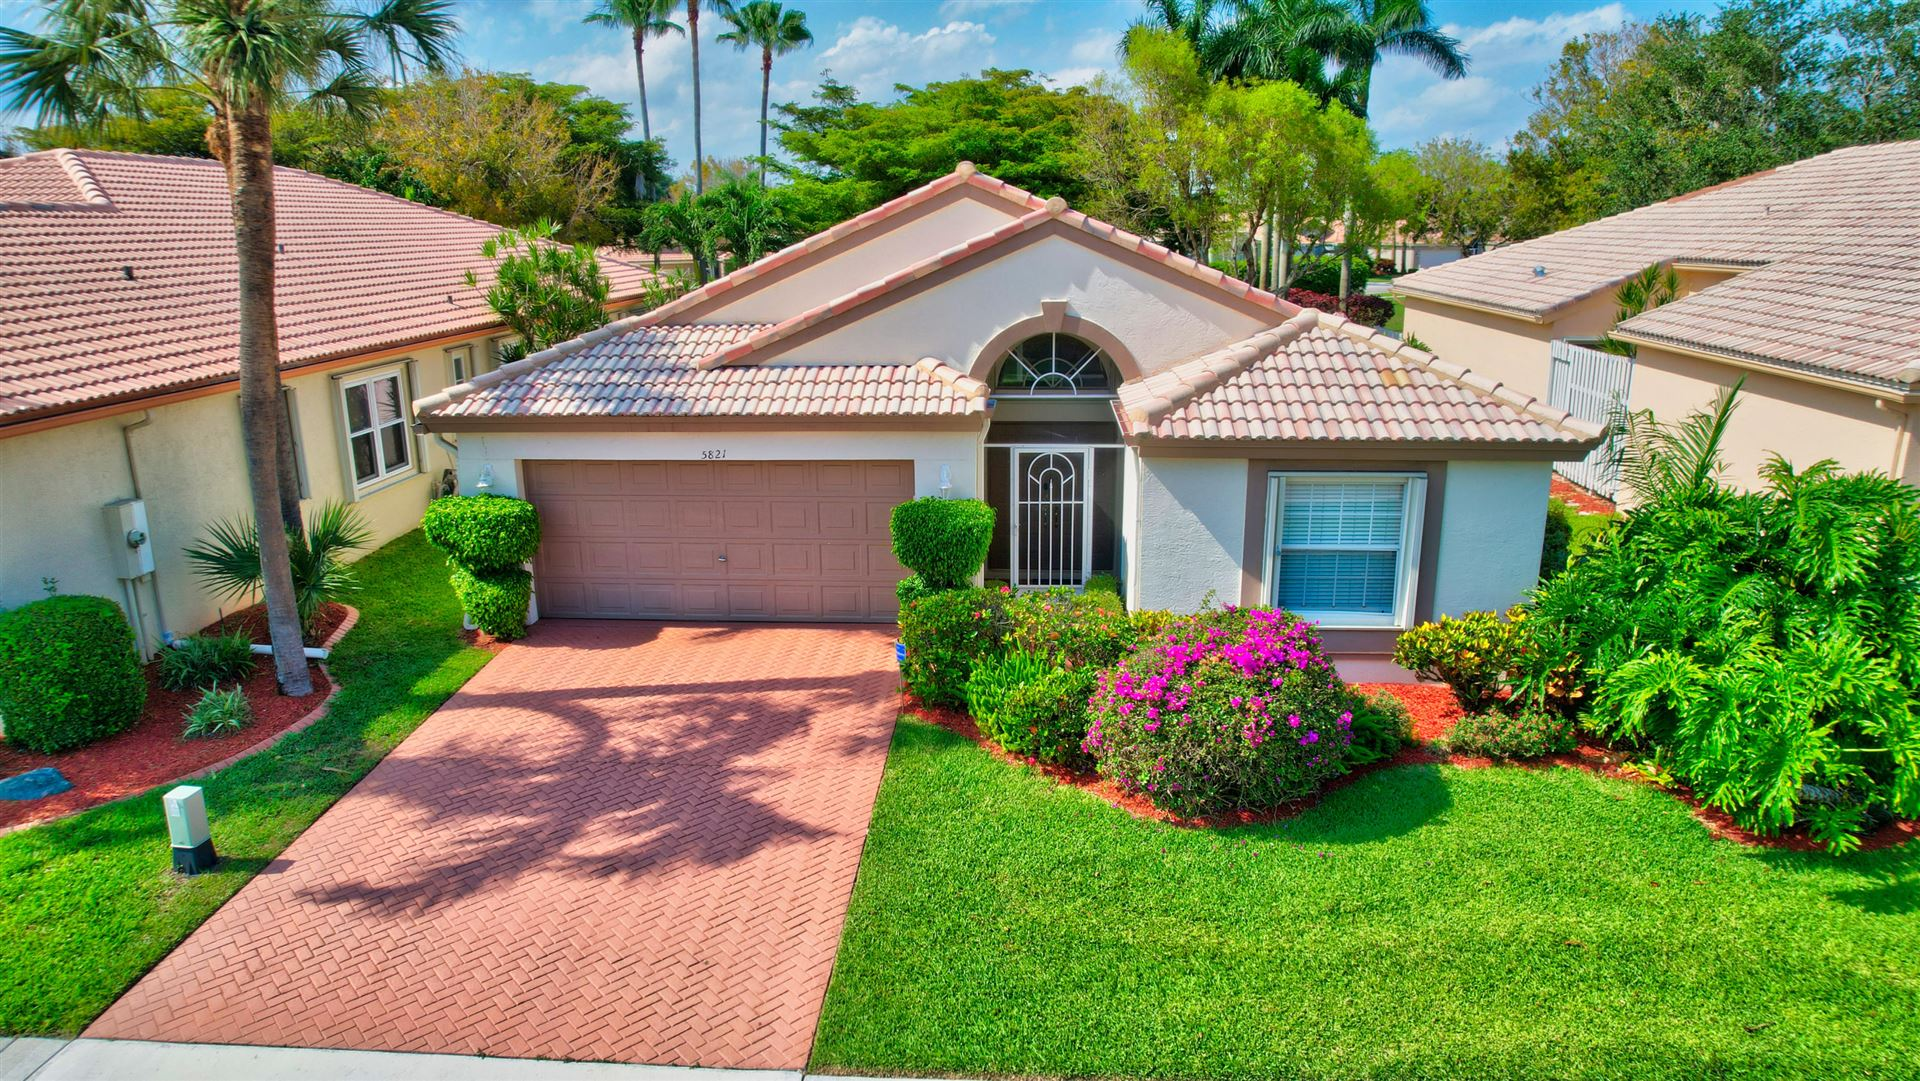 5821 Seashell Terrace, Boynton Beach, FL 33437 - MLS#: RX-10710455